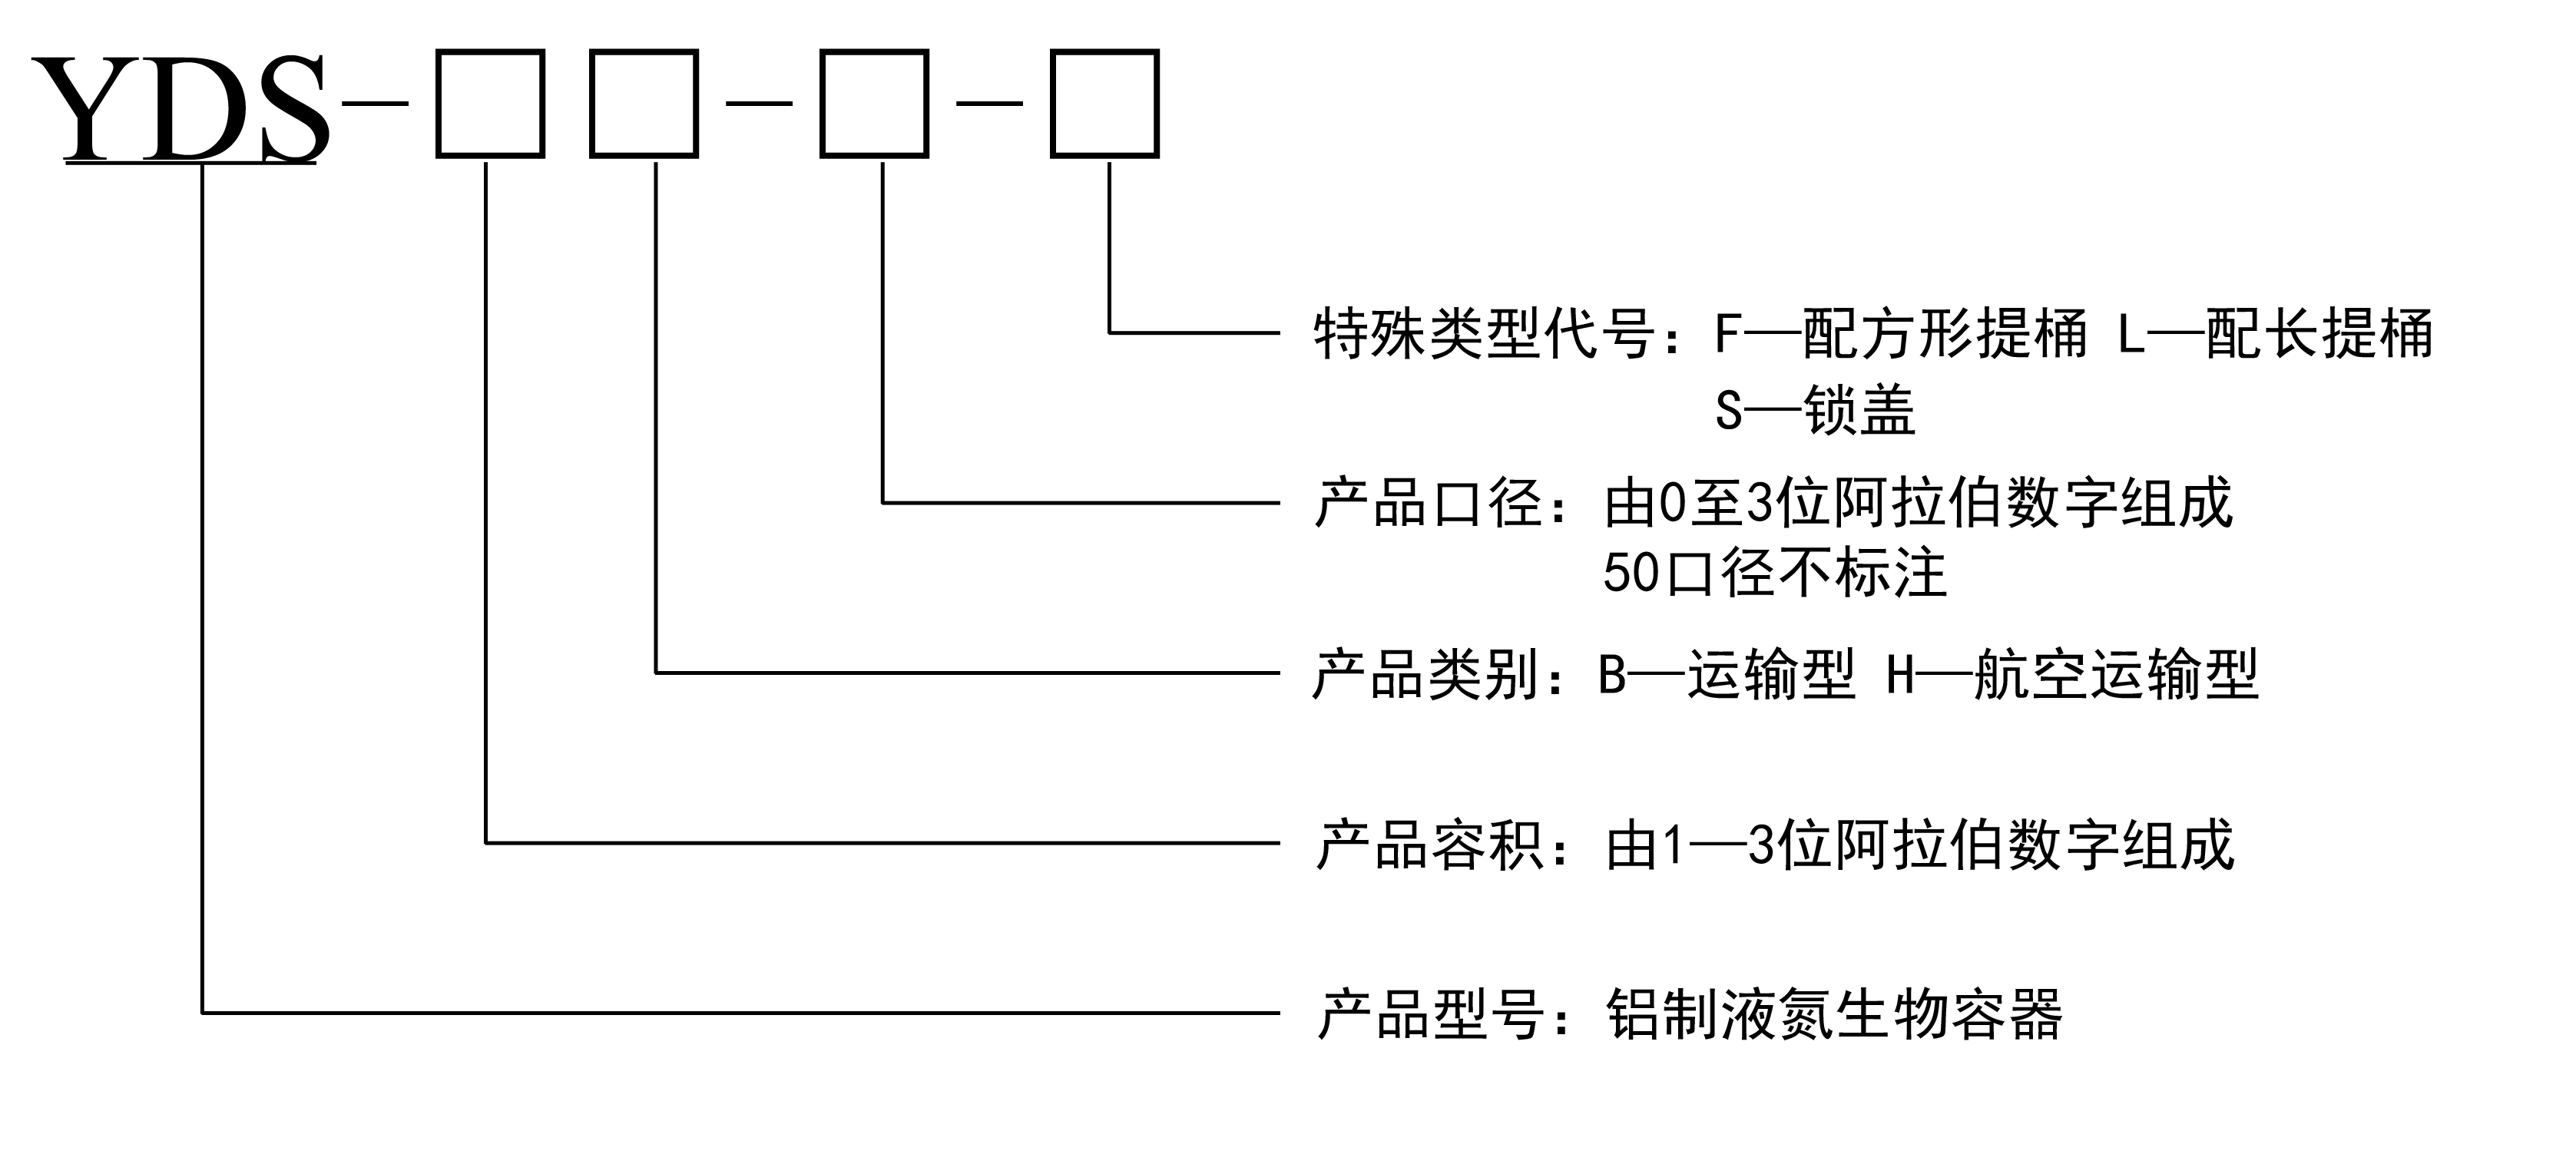 YDS-50B-80 TC运输专用铝合金液氮罐